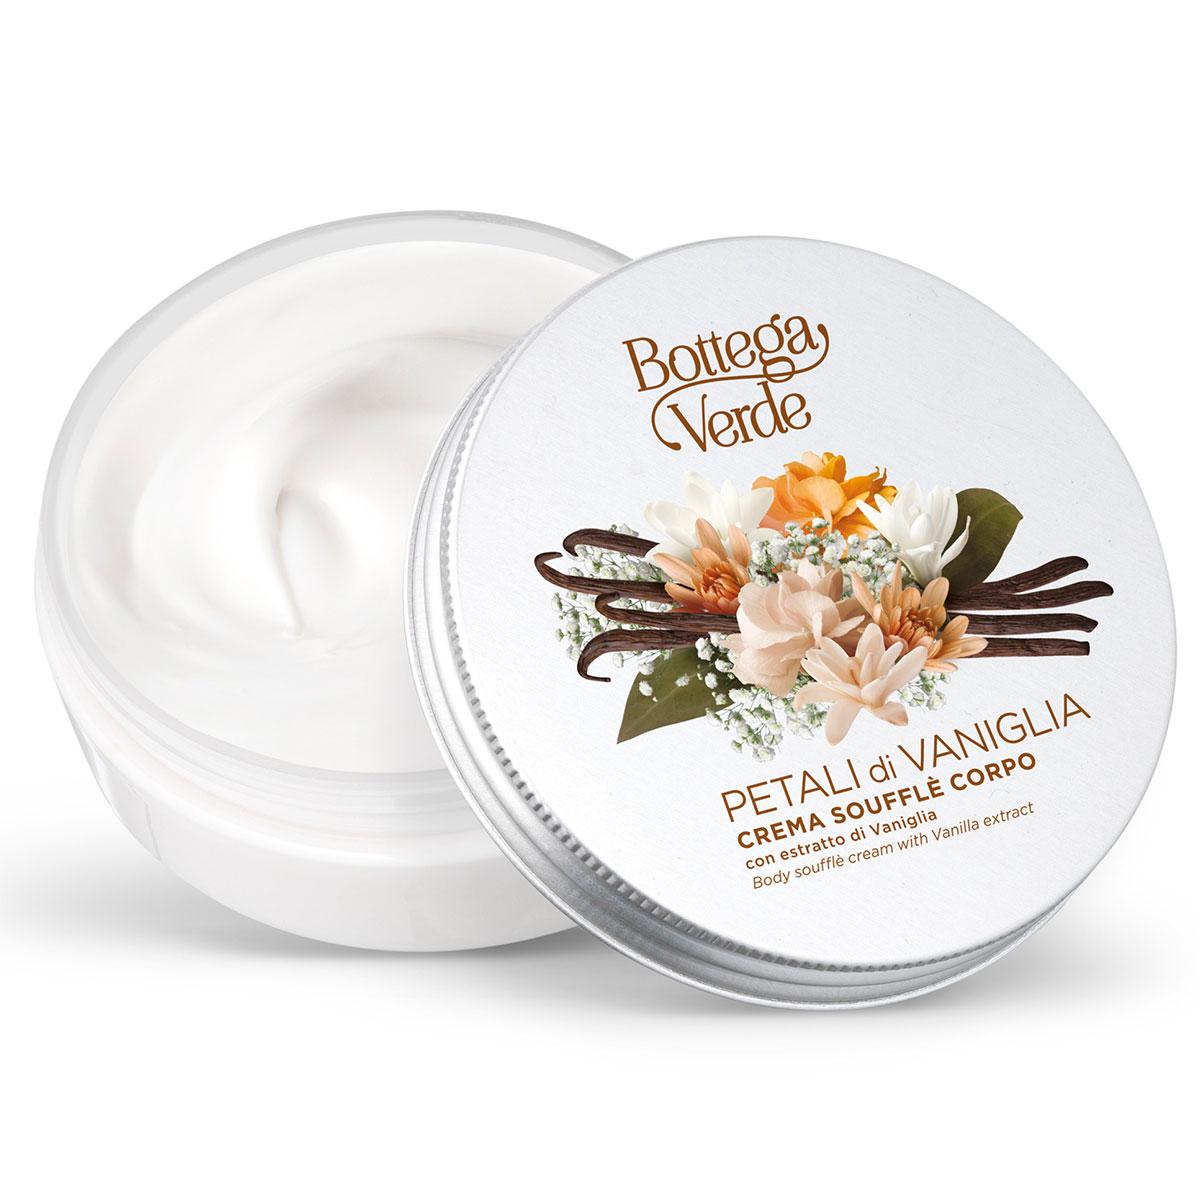 Crema corp fina cu extract de vanilie - Petali di Vaniglia, 150 ML